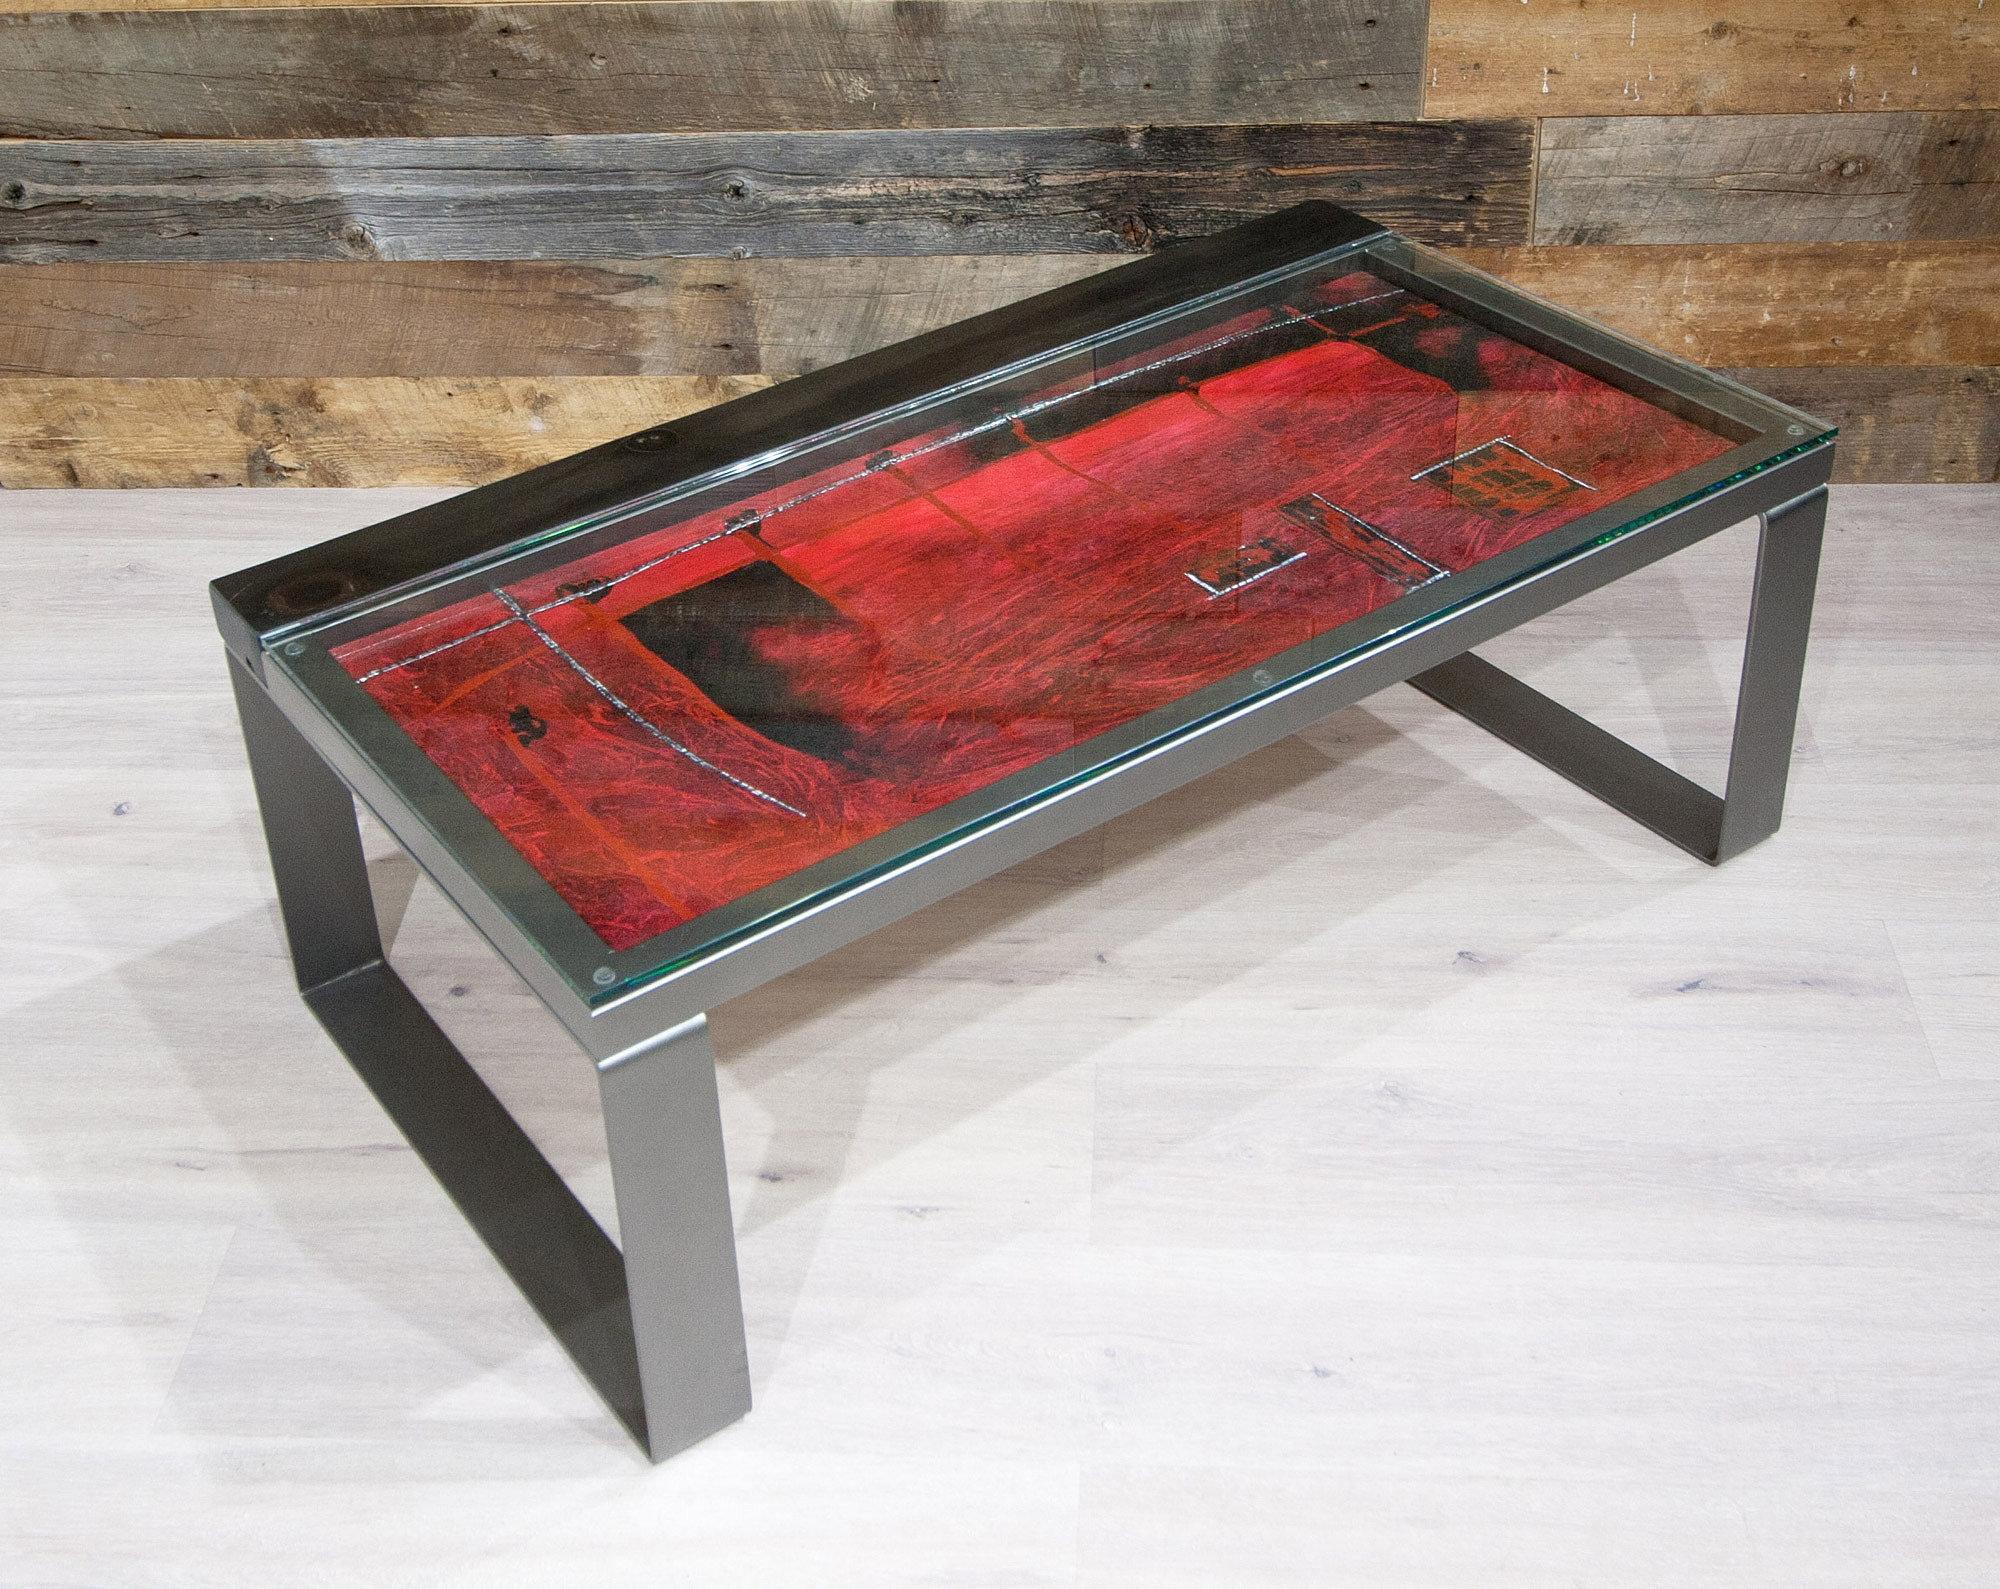 forge design | meubles | bois et métal | art nova - cielo de fuego - Meuble Design Metal